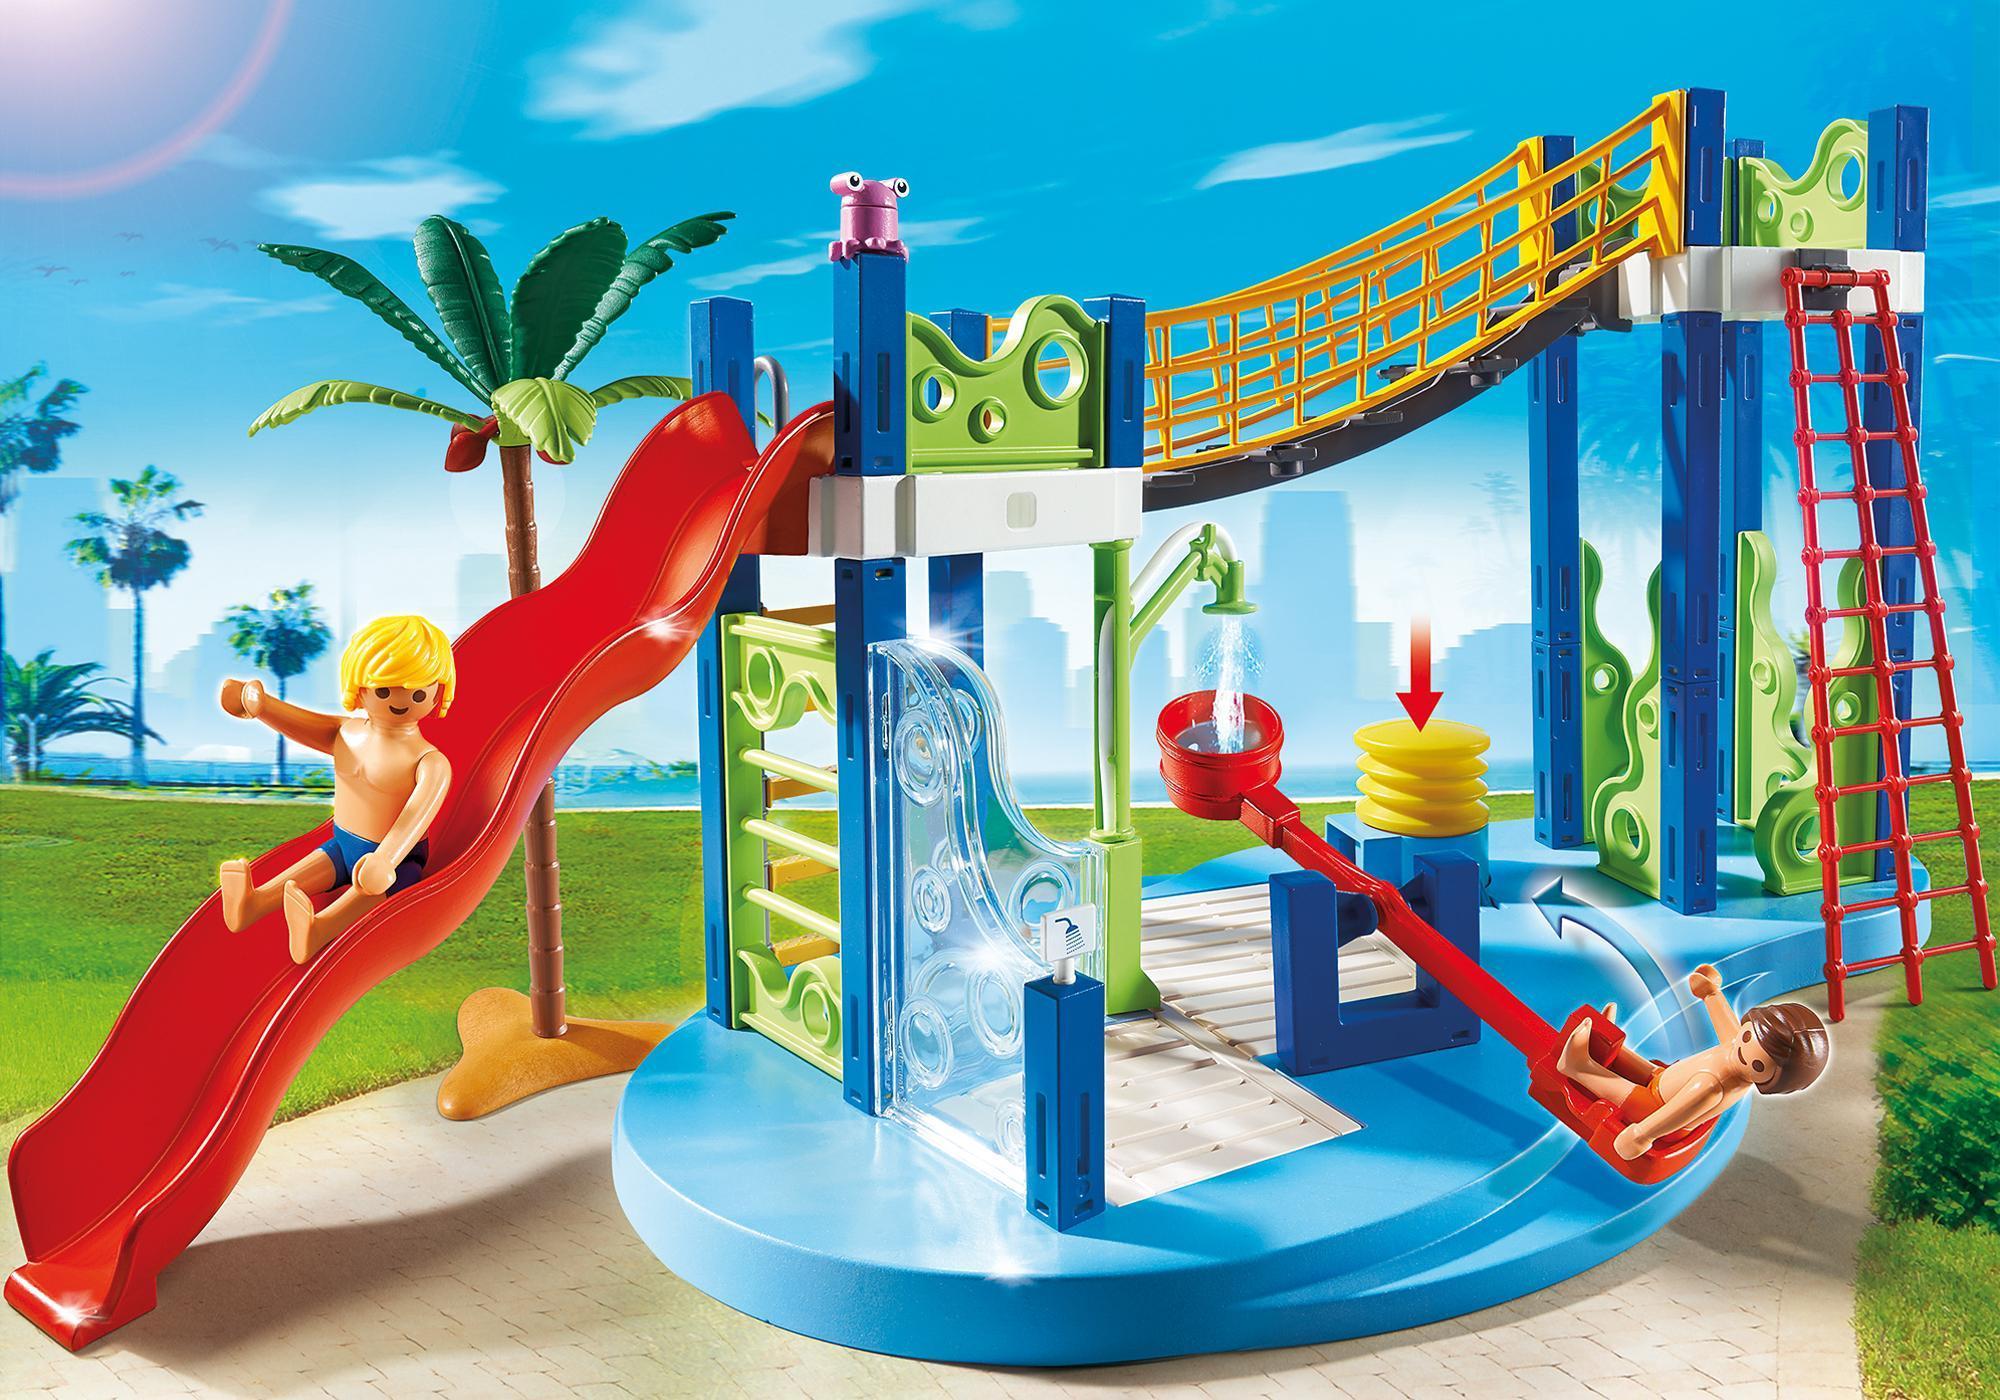 http://media.playmobil.com/i/playmobil/6670_product_detail/Water Park Play Area